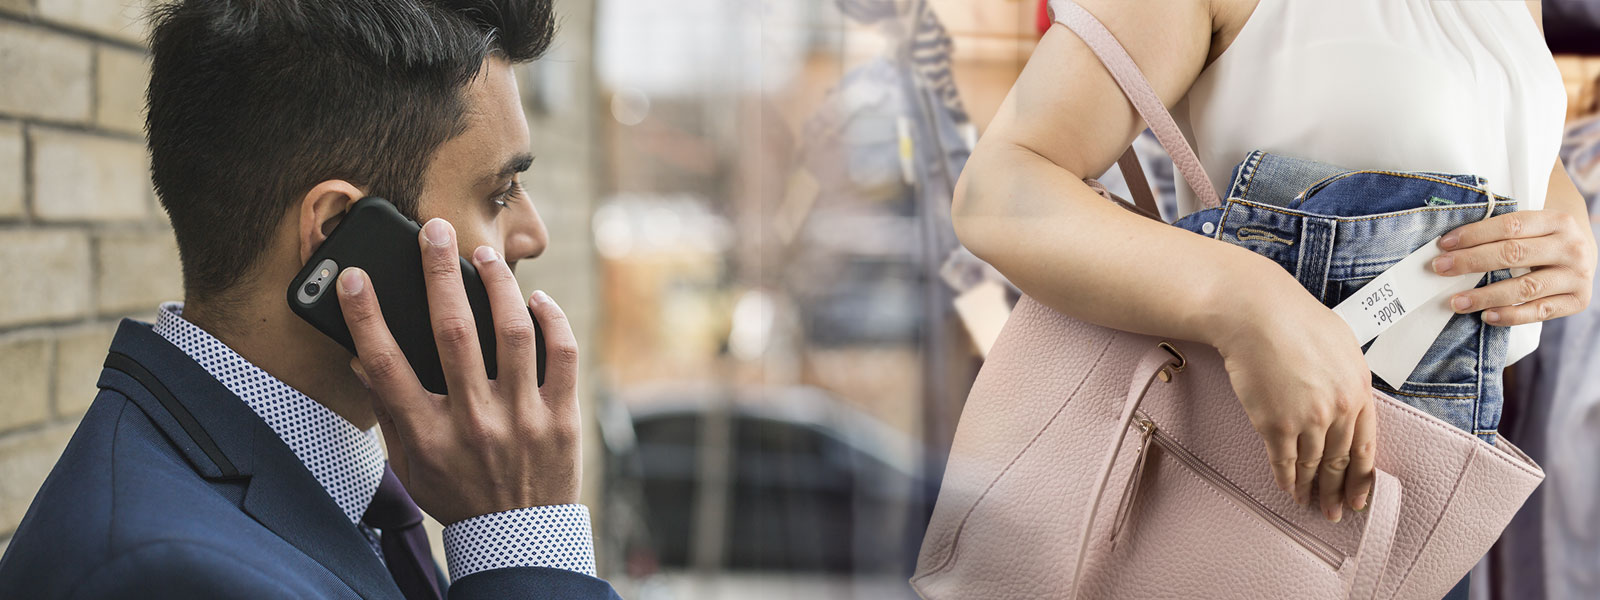 7 Ways to Deter Internal Theft